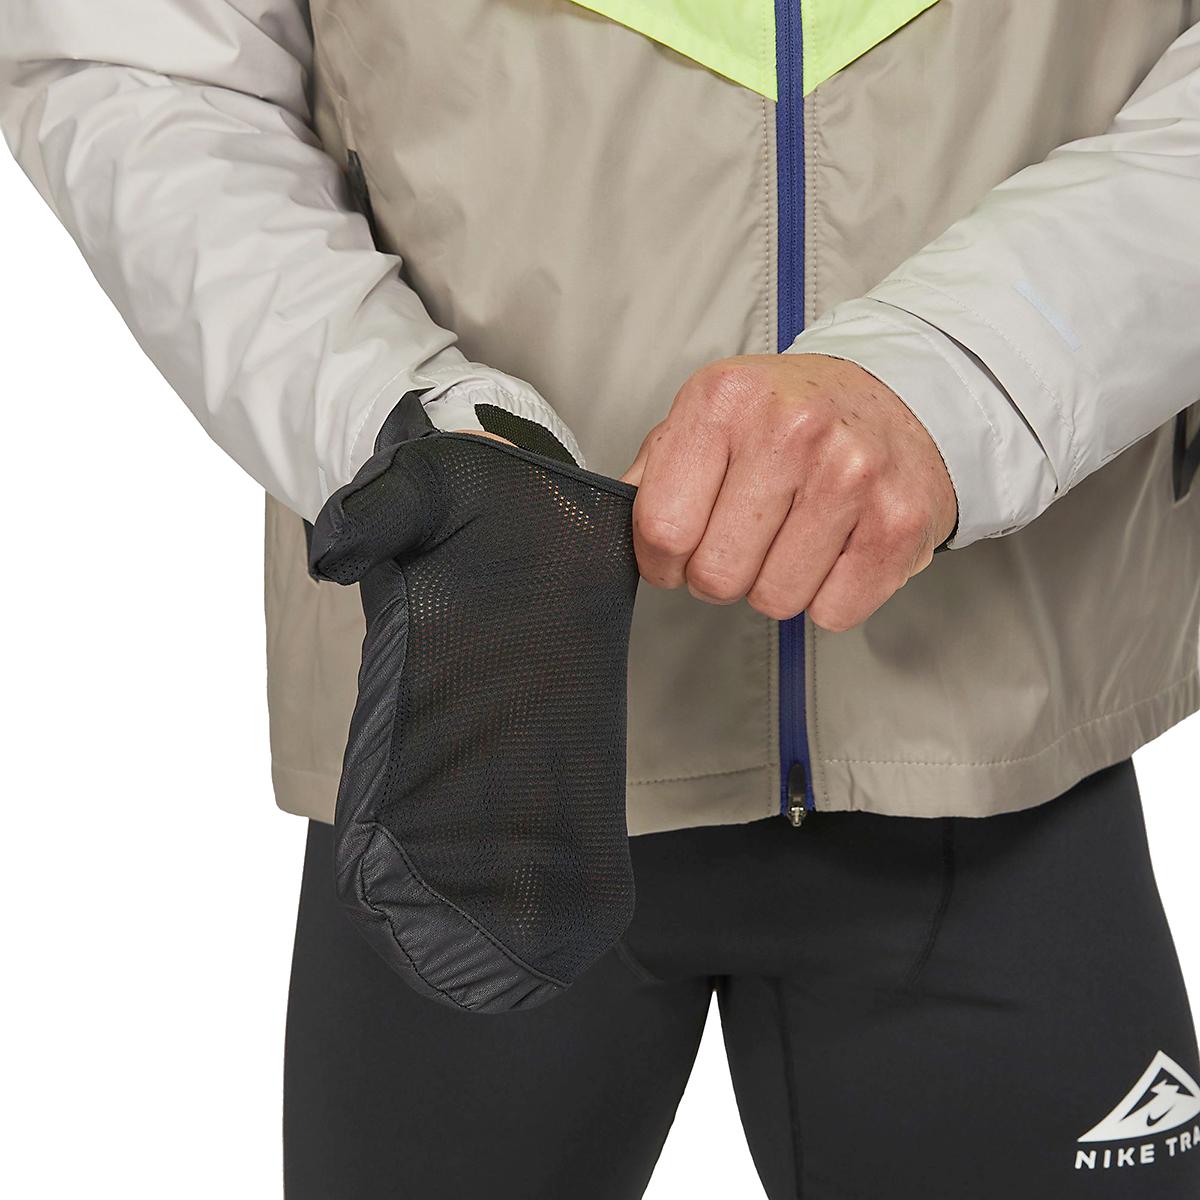 Men's Nike Windrunner Trail Running Jacket - Color: Light Lemon Twist/Moon Fossil/Bright Spruce - Size: S, Light Lemon Twist/Moon Fossil/Bright Spruce, large, image 5